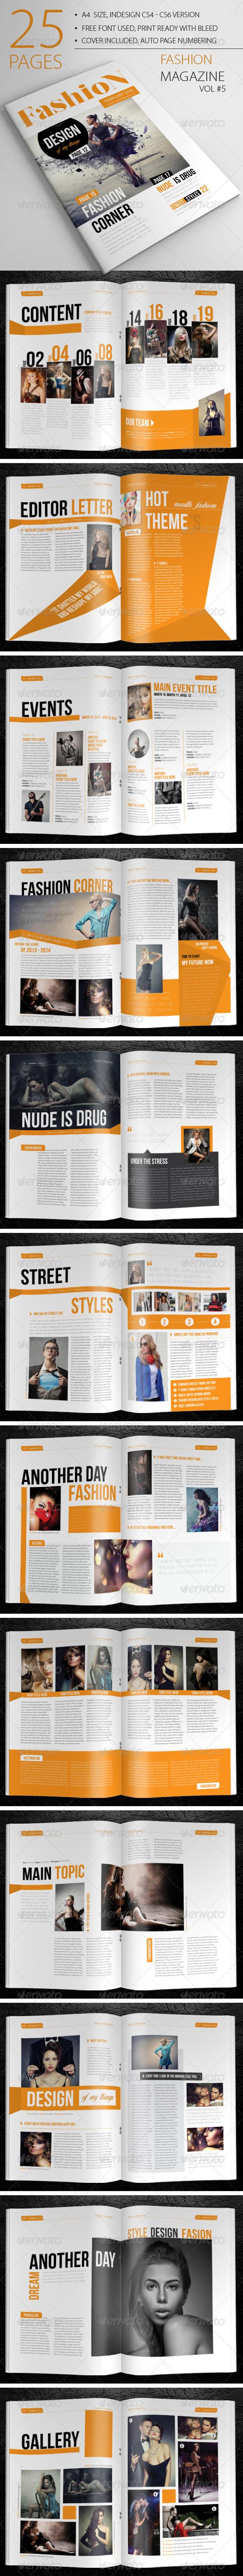 GraphicRiver 25 Pages Fashion Magazine Vol5 6835139